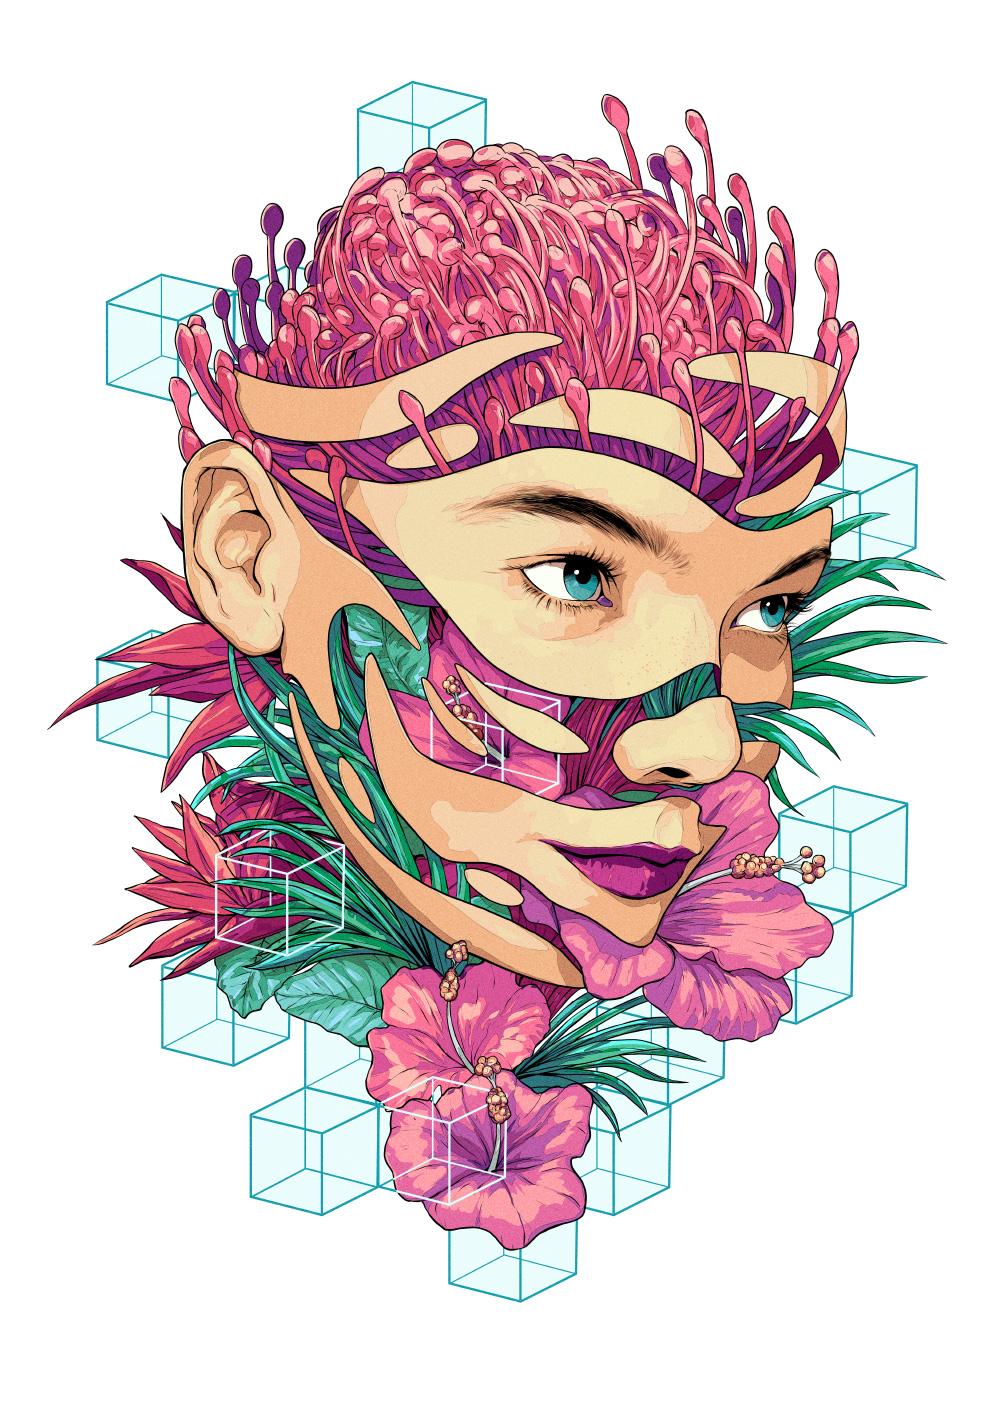 The Psychedelic Illustrations of Matt Chu